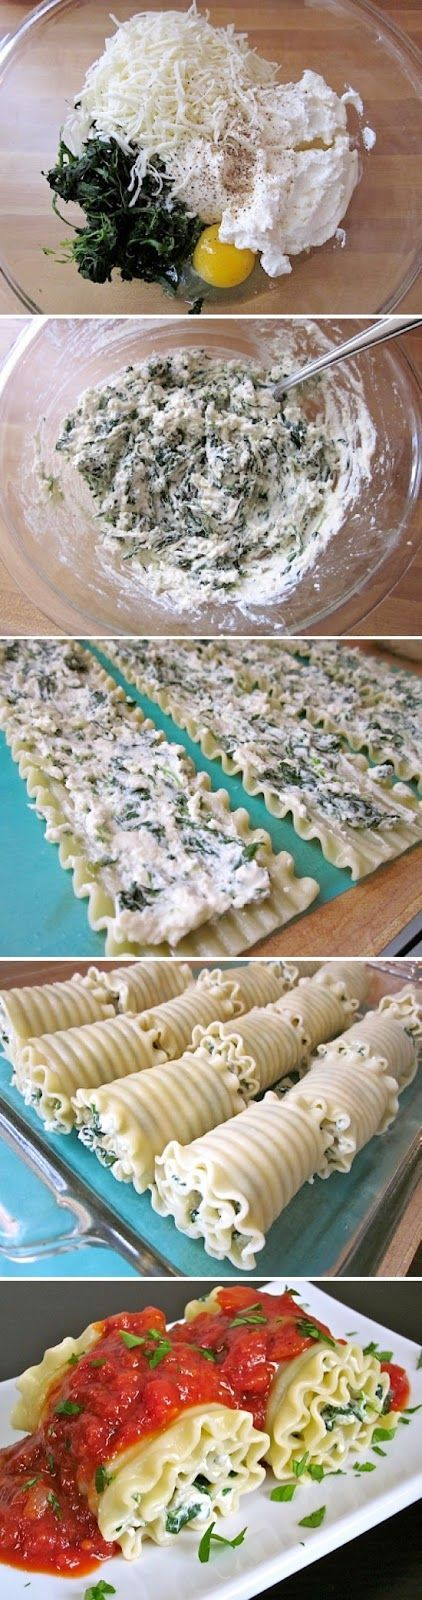 Spinach Lasagna Roll Ups Recipe